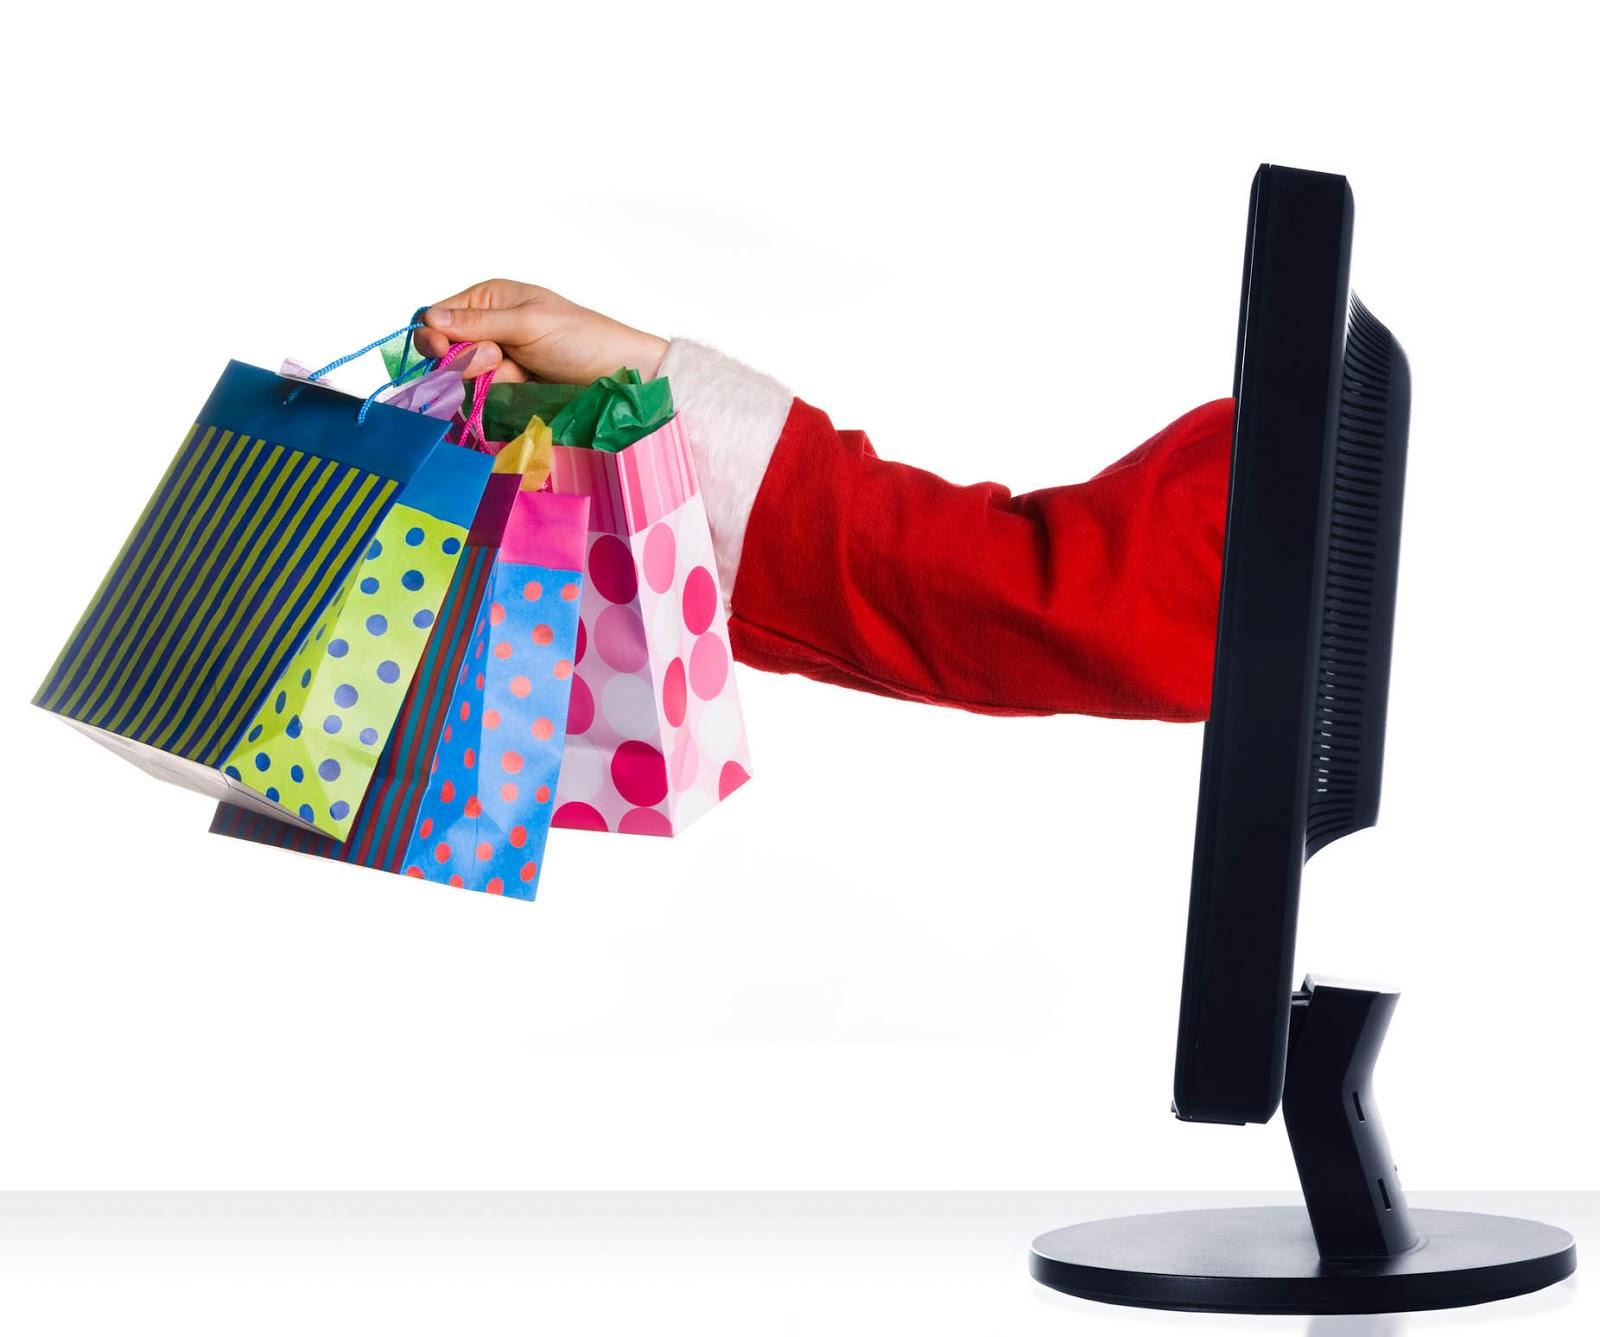 Online Wallpaper: Online-shopping-image-wallpaper